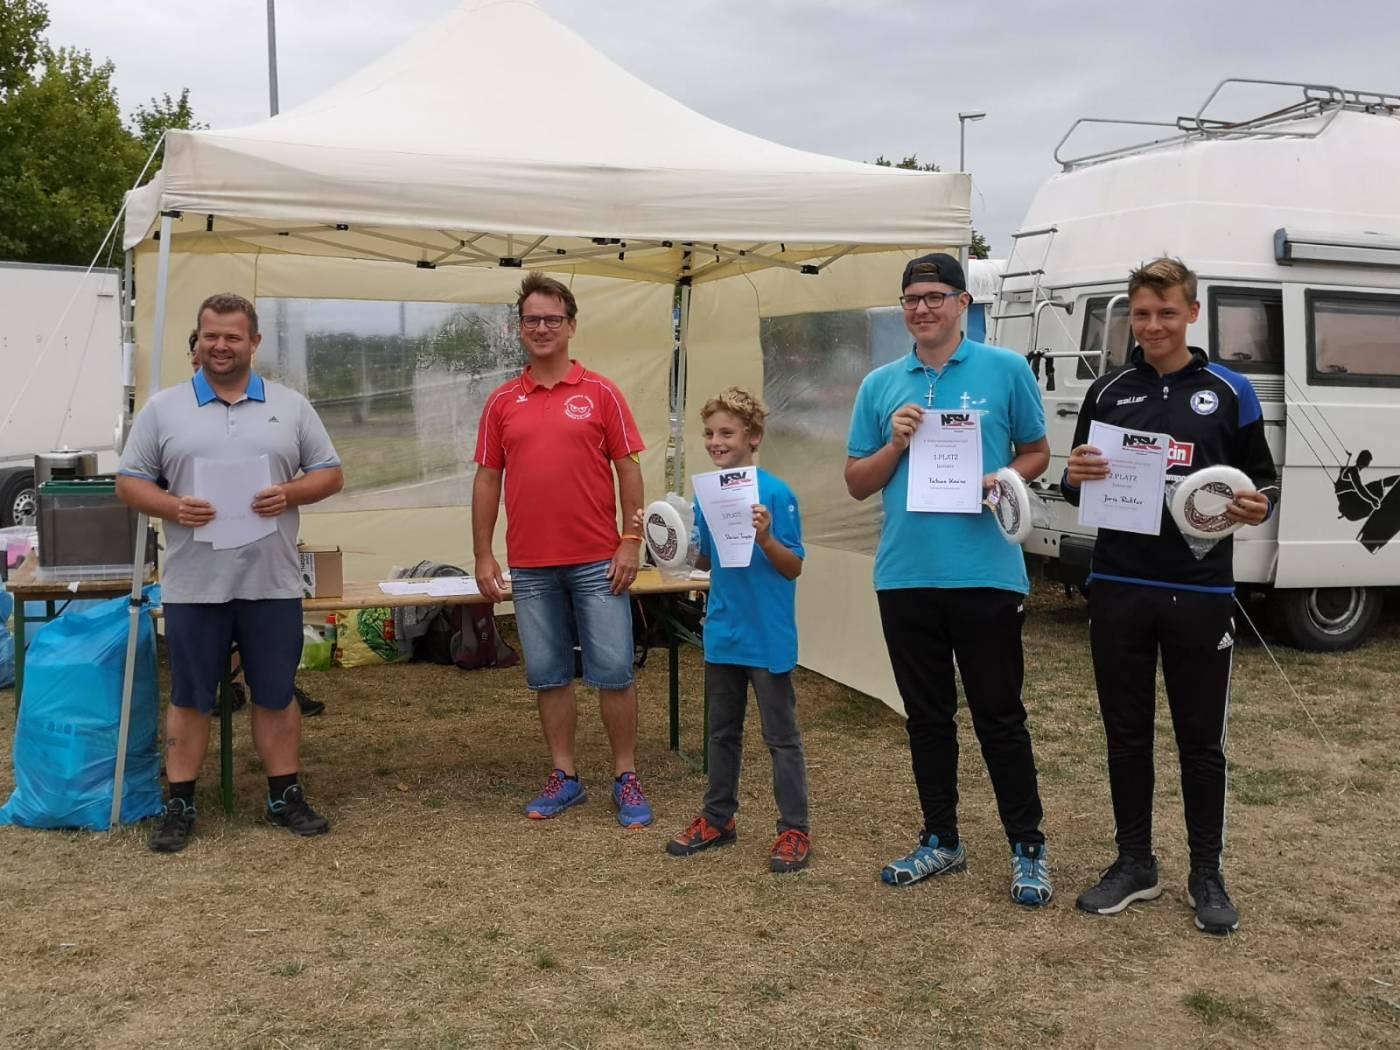 2018-09-02_NDS Landesmeisterschaft Discgolf Hannover 2018_038